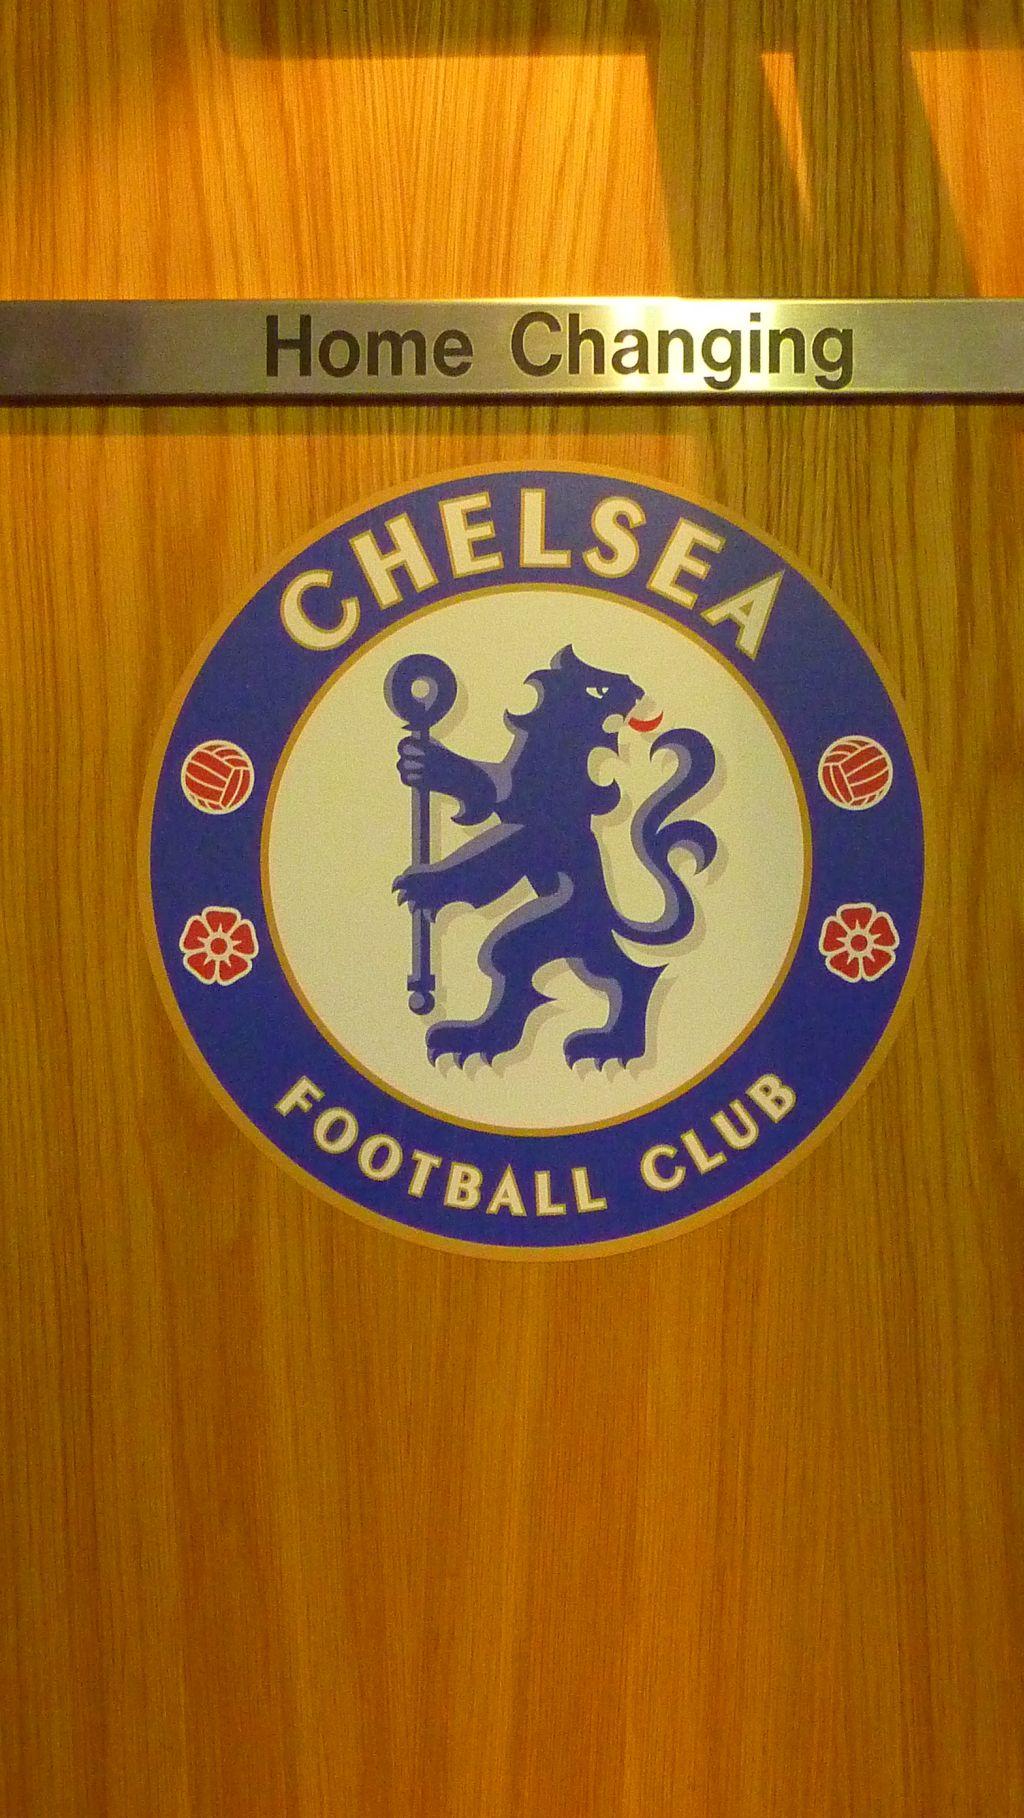 Visiting Chelsea Football Club Stadium Minty Trips Blog